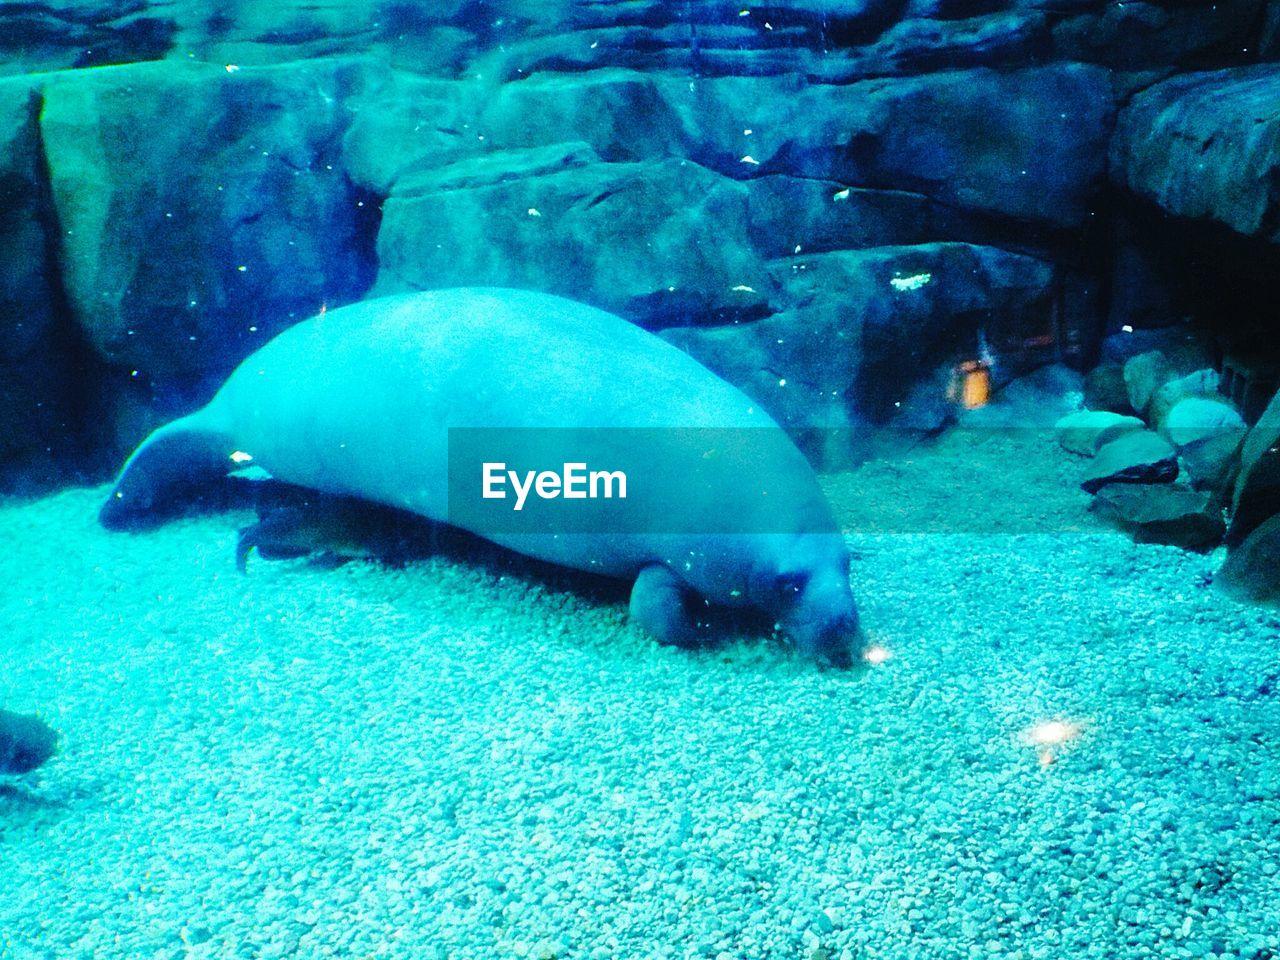 animal themes, animals in the wild, water, sea life, swimming, wildlife, underwater, animal wildlife, nature, no people, undersea, sea, day, aquarium, aquatic mammal, beauty in nature, outdoors, mammal, close-up